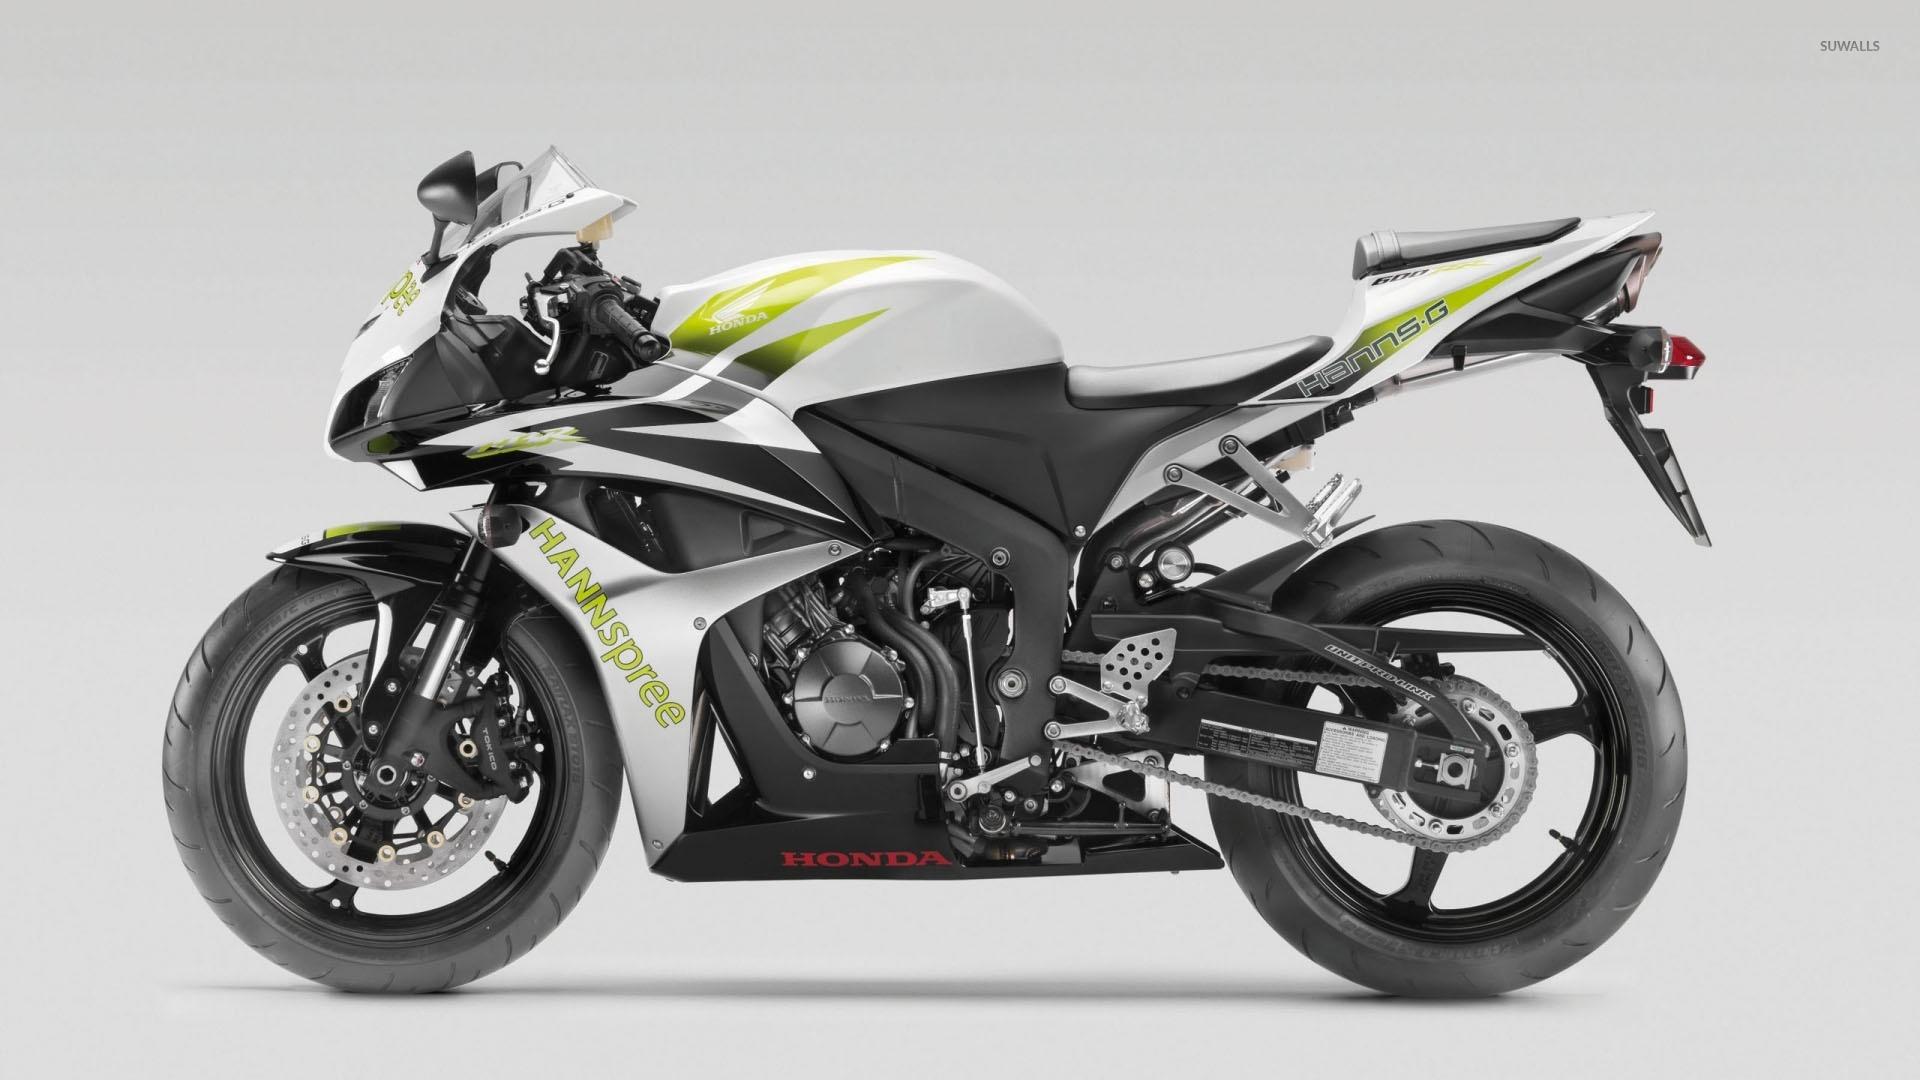 Honda Cbr600rr 6 Wallpaper Motorcycle Wallpapers 23838